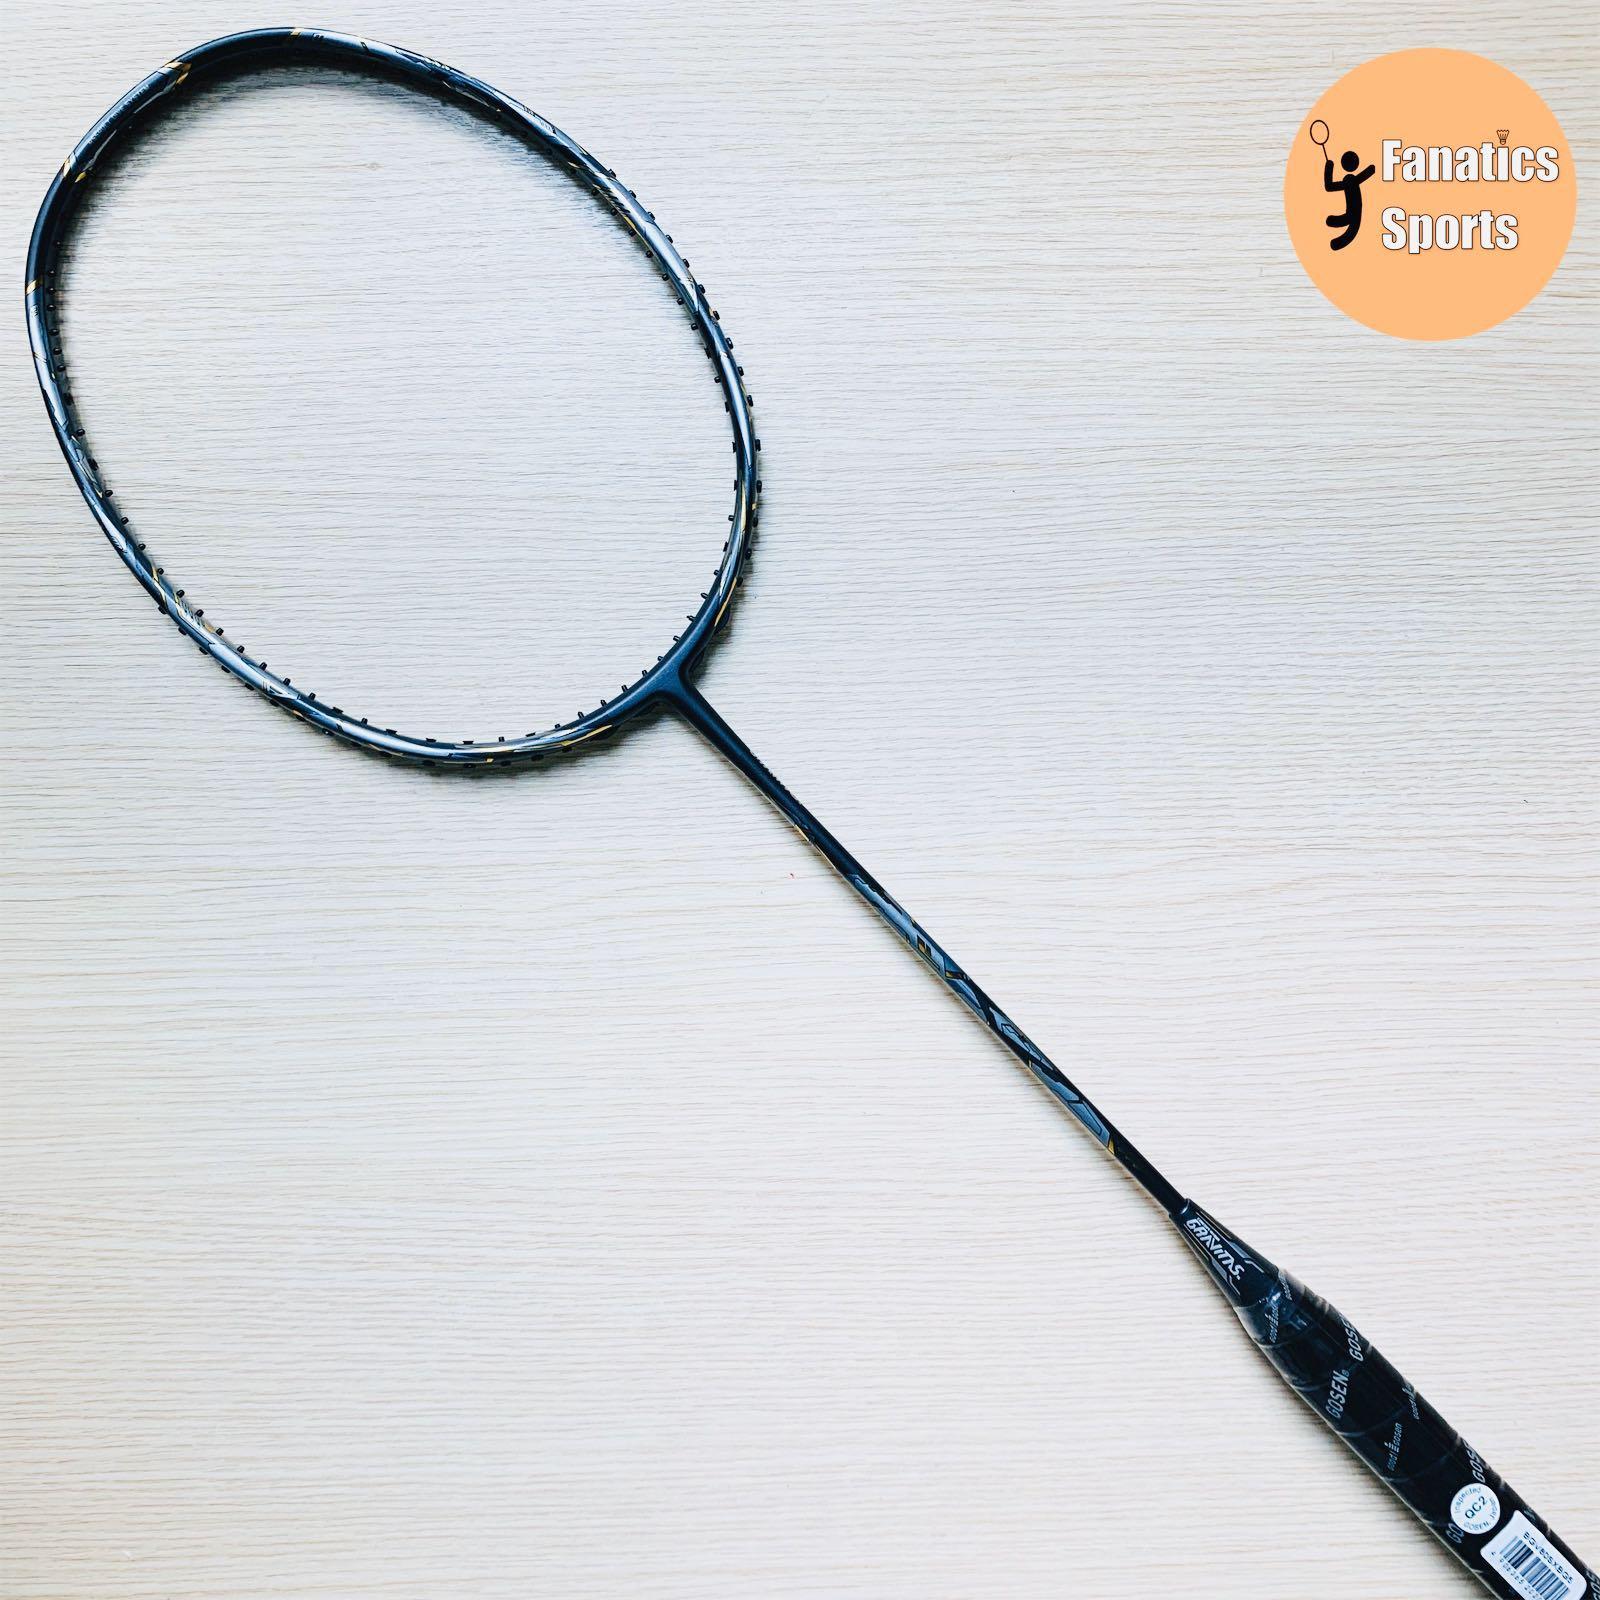 Brand New Gosen Gravitas 8.0 SX Heavy Striker Badminton Racket